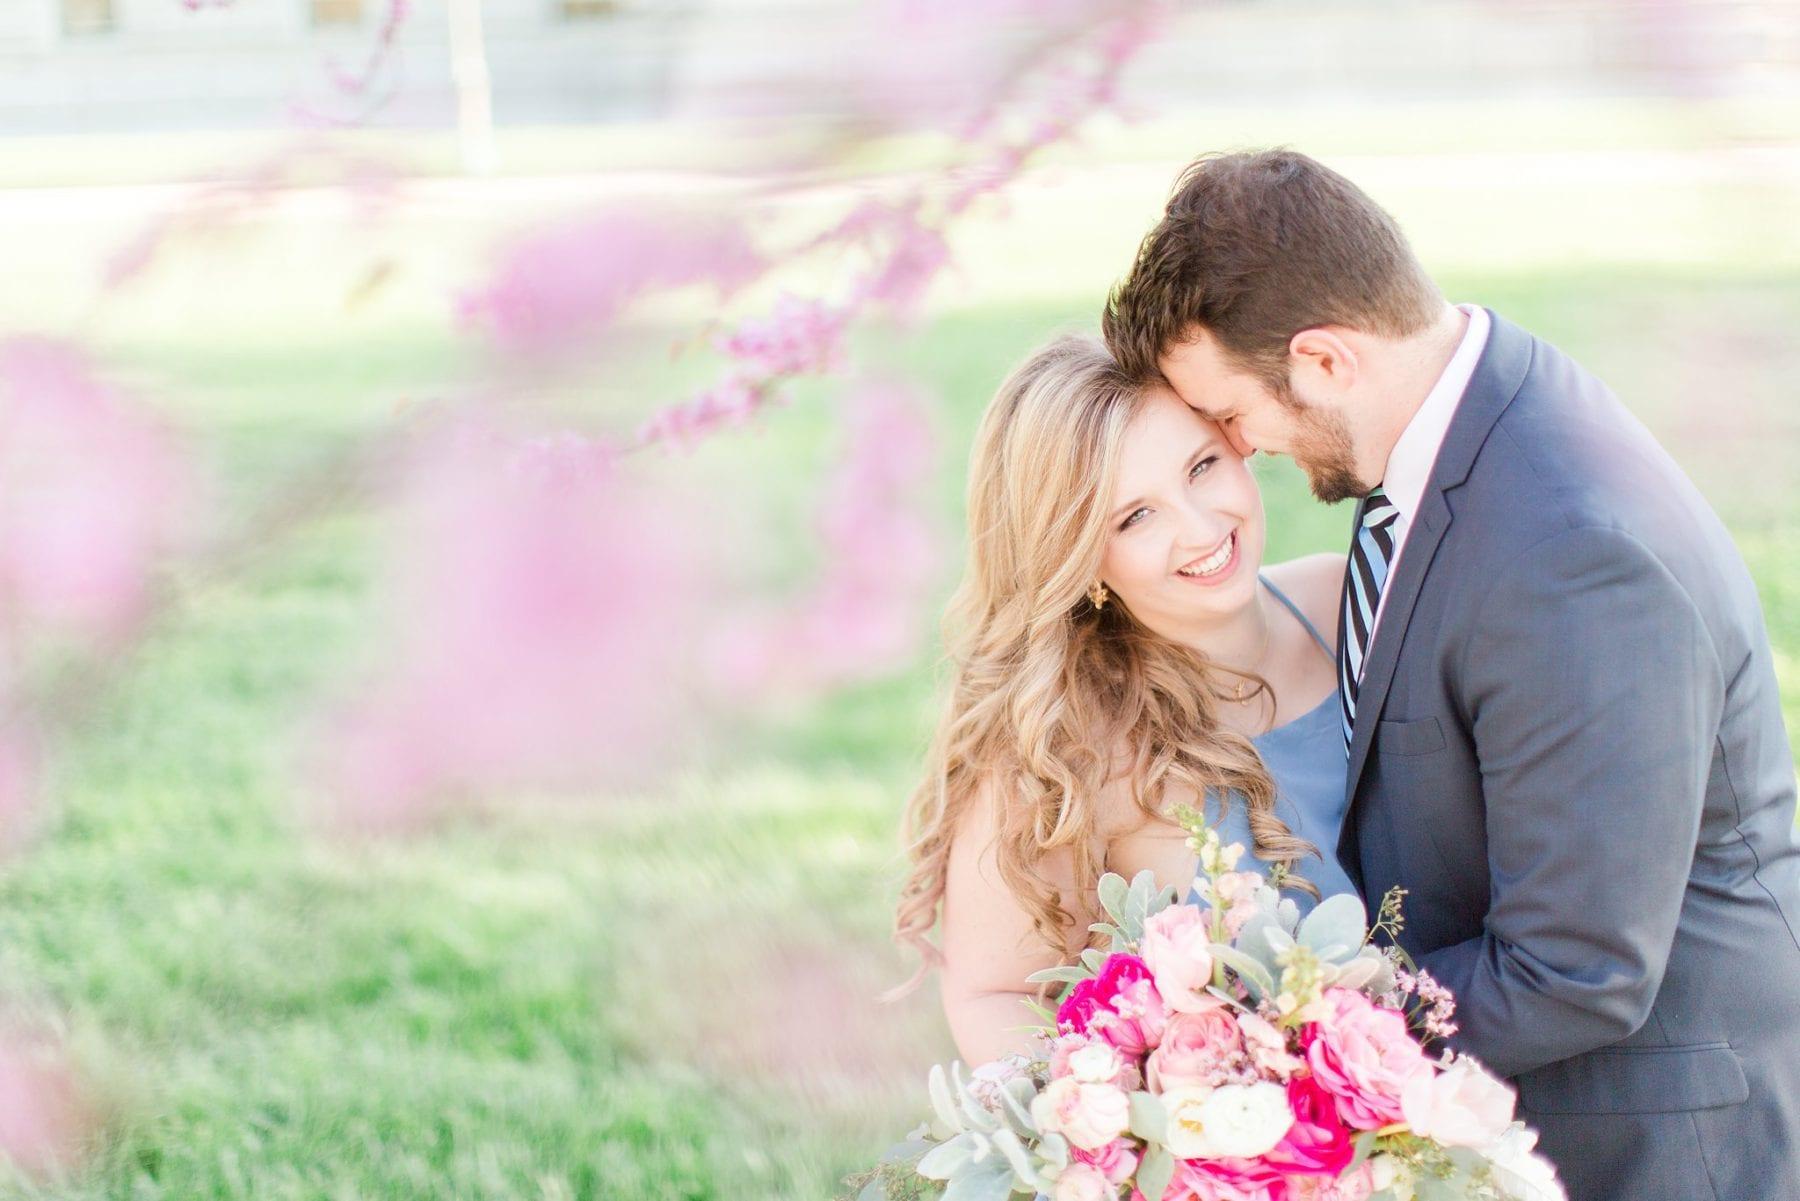 Capitol Hill Engagement Photos Kelly & Zach Washington DC Wedding Photographer Megan Kelsey Photography-76.jpg